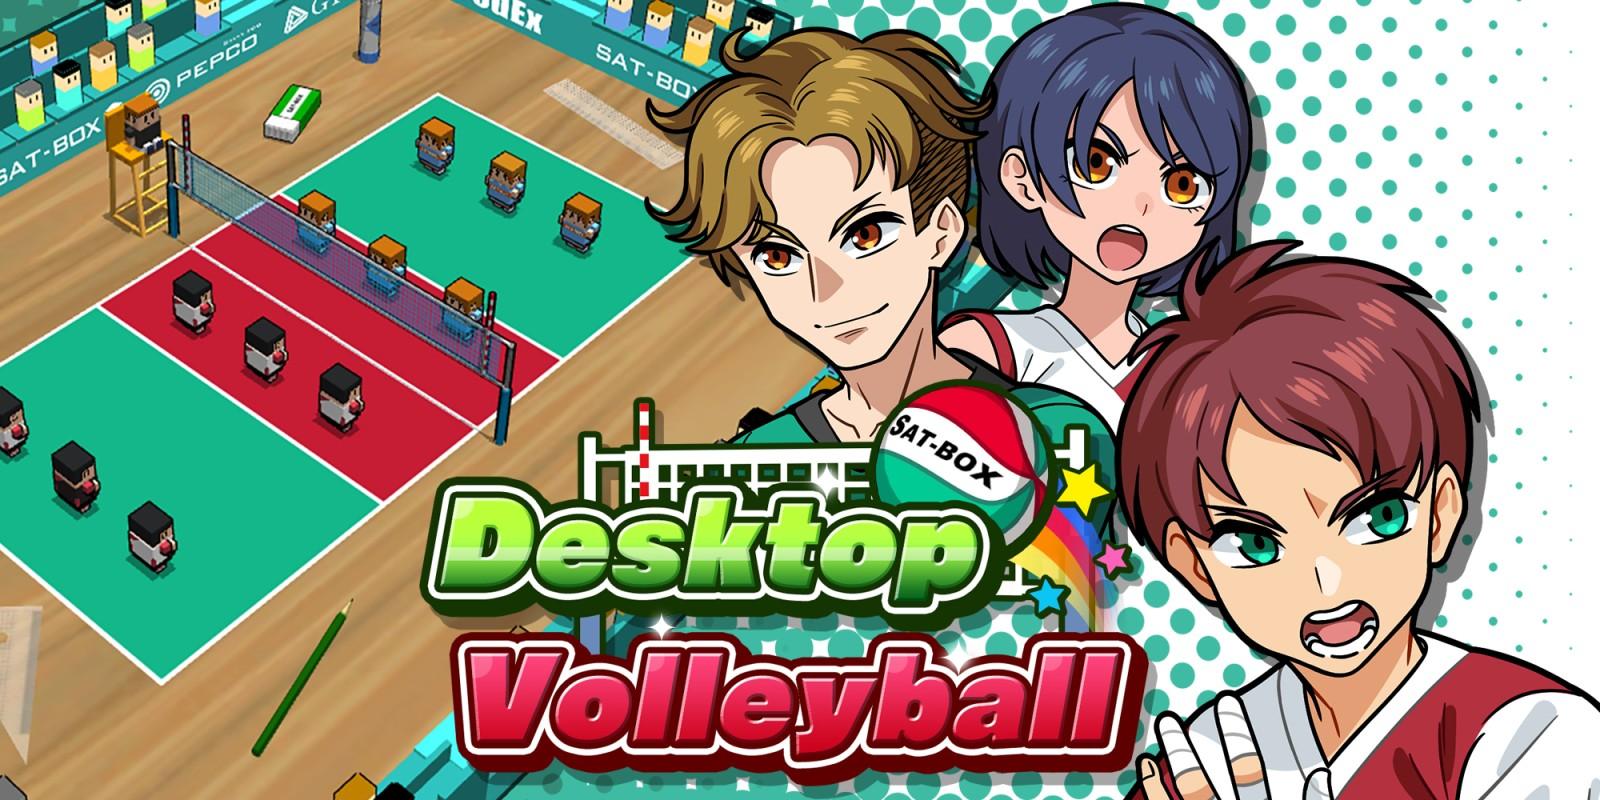 Desktop Volleyball